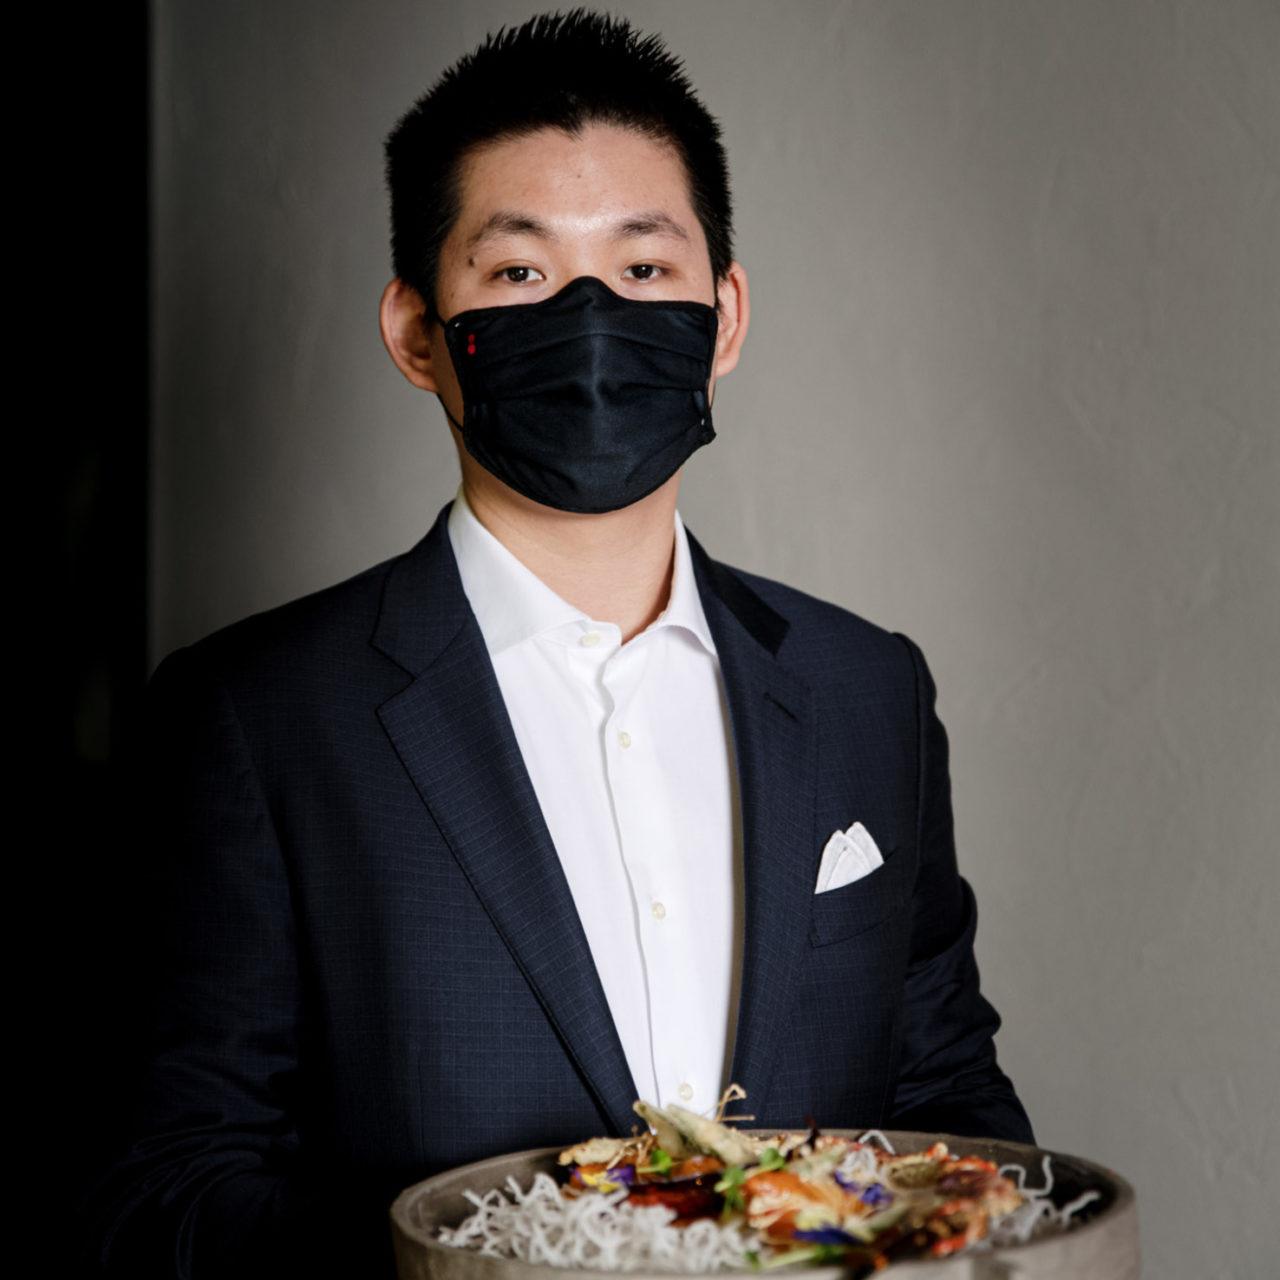 Ba ristorante cinese Milano Marco Liu